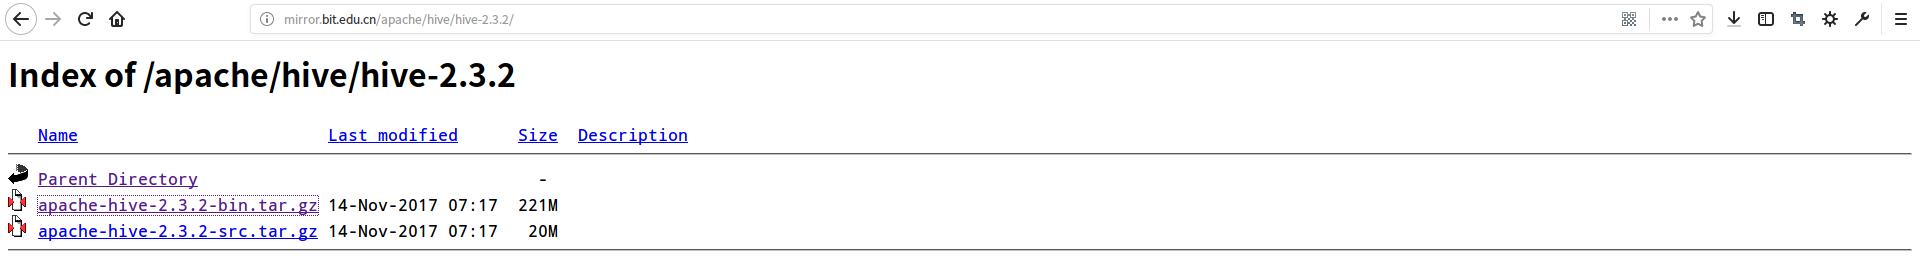 hive(01)、基于hadoop集群的数据仓库Hive搭建实践...